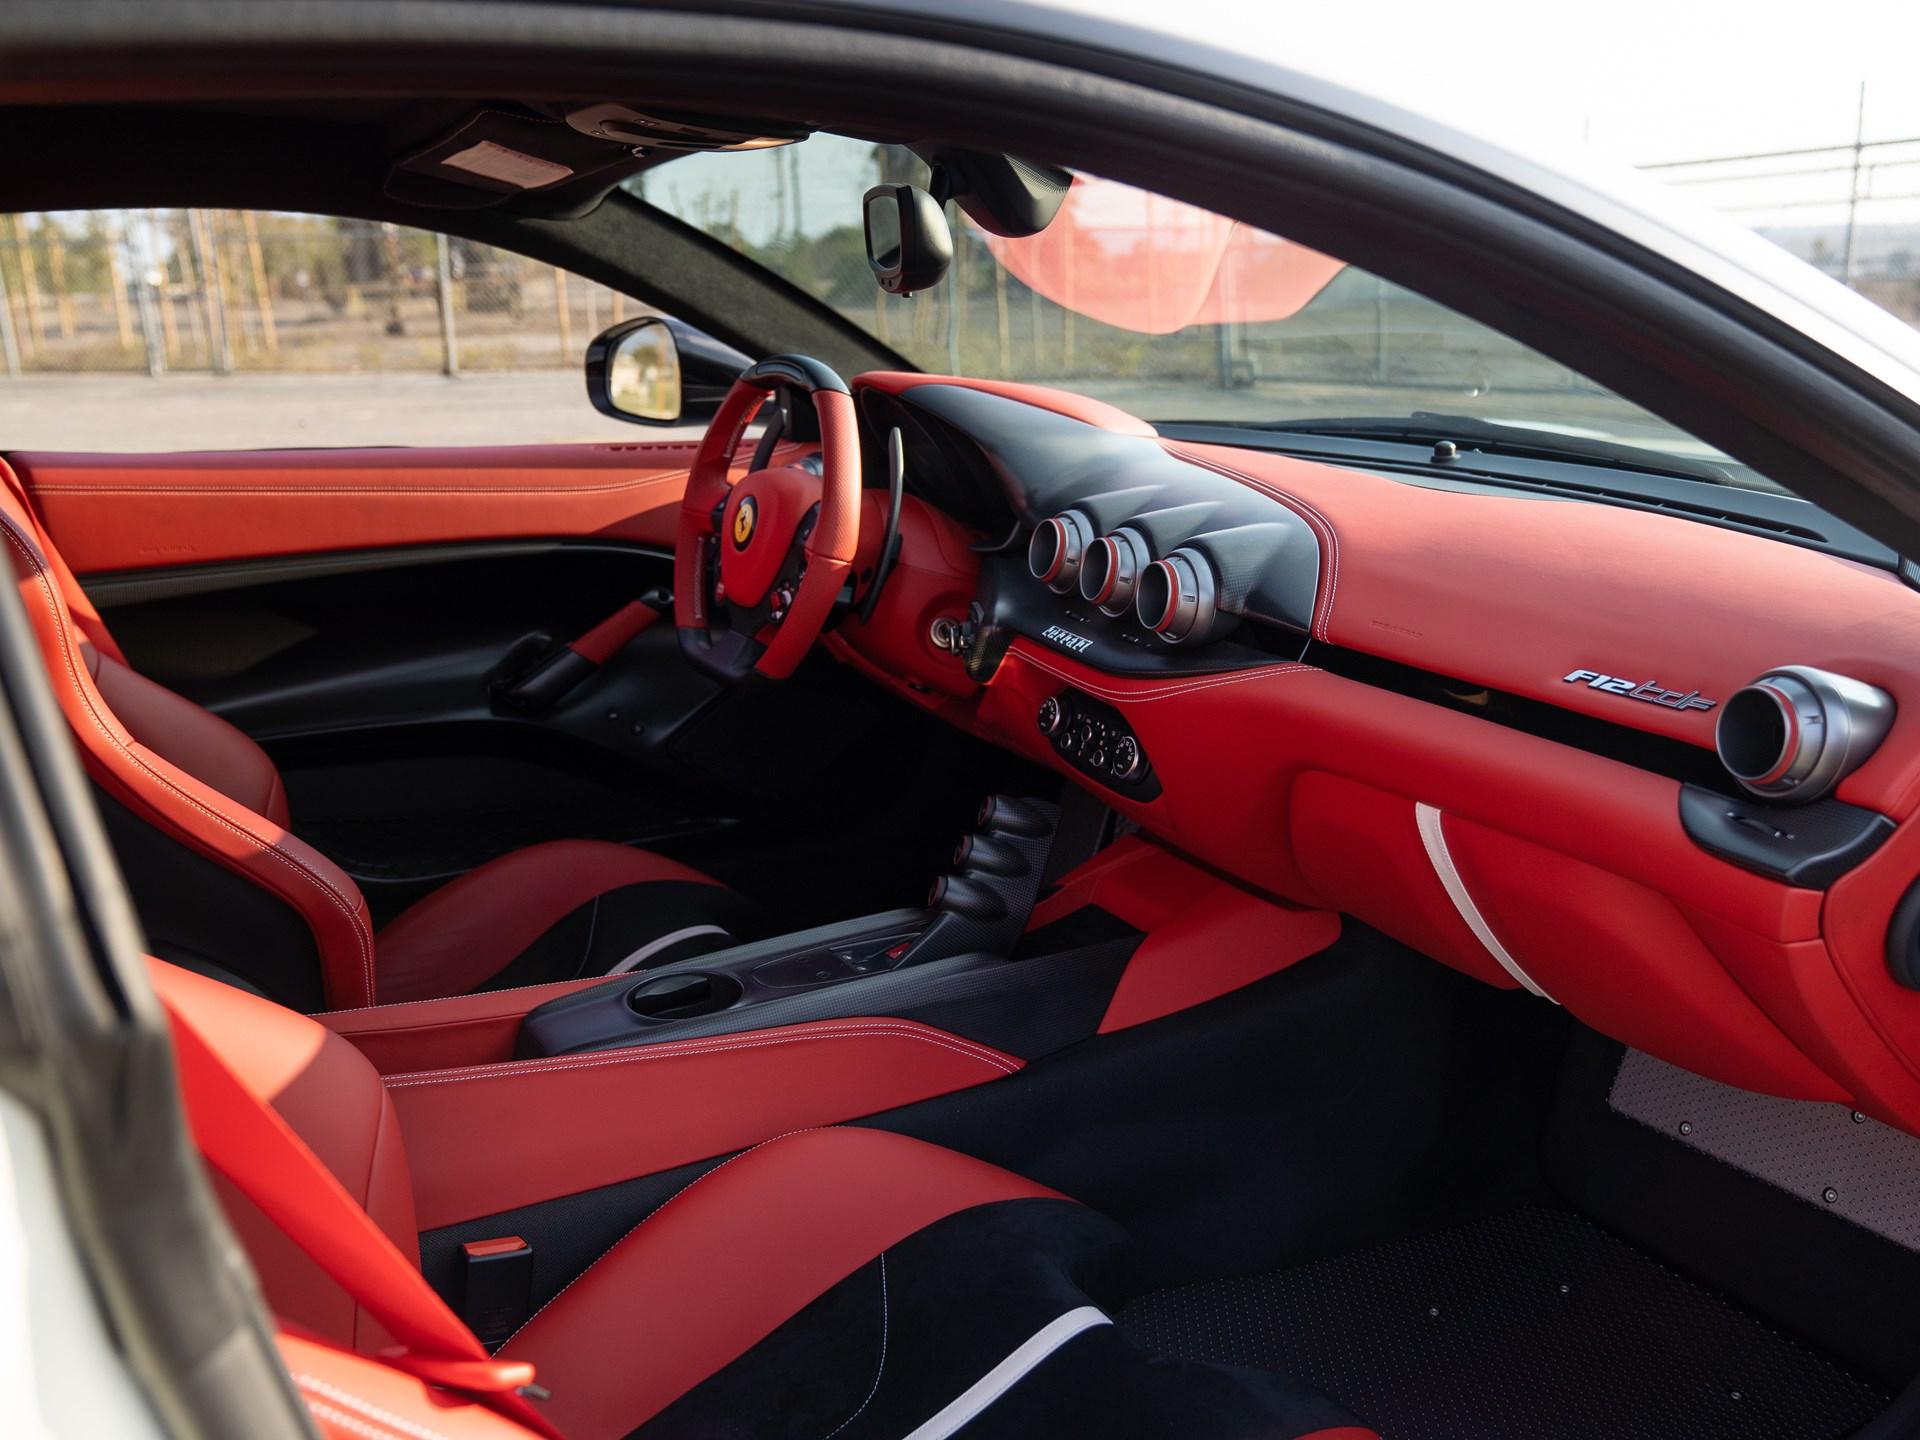 2017 Ferrari F12tdf interior dash passenger